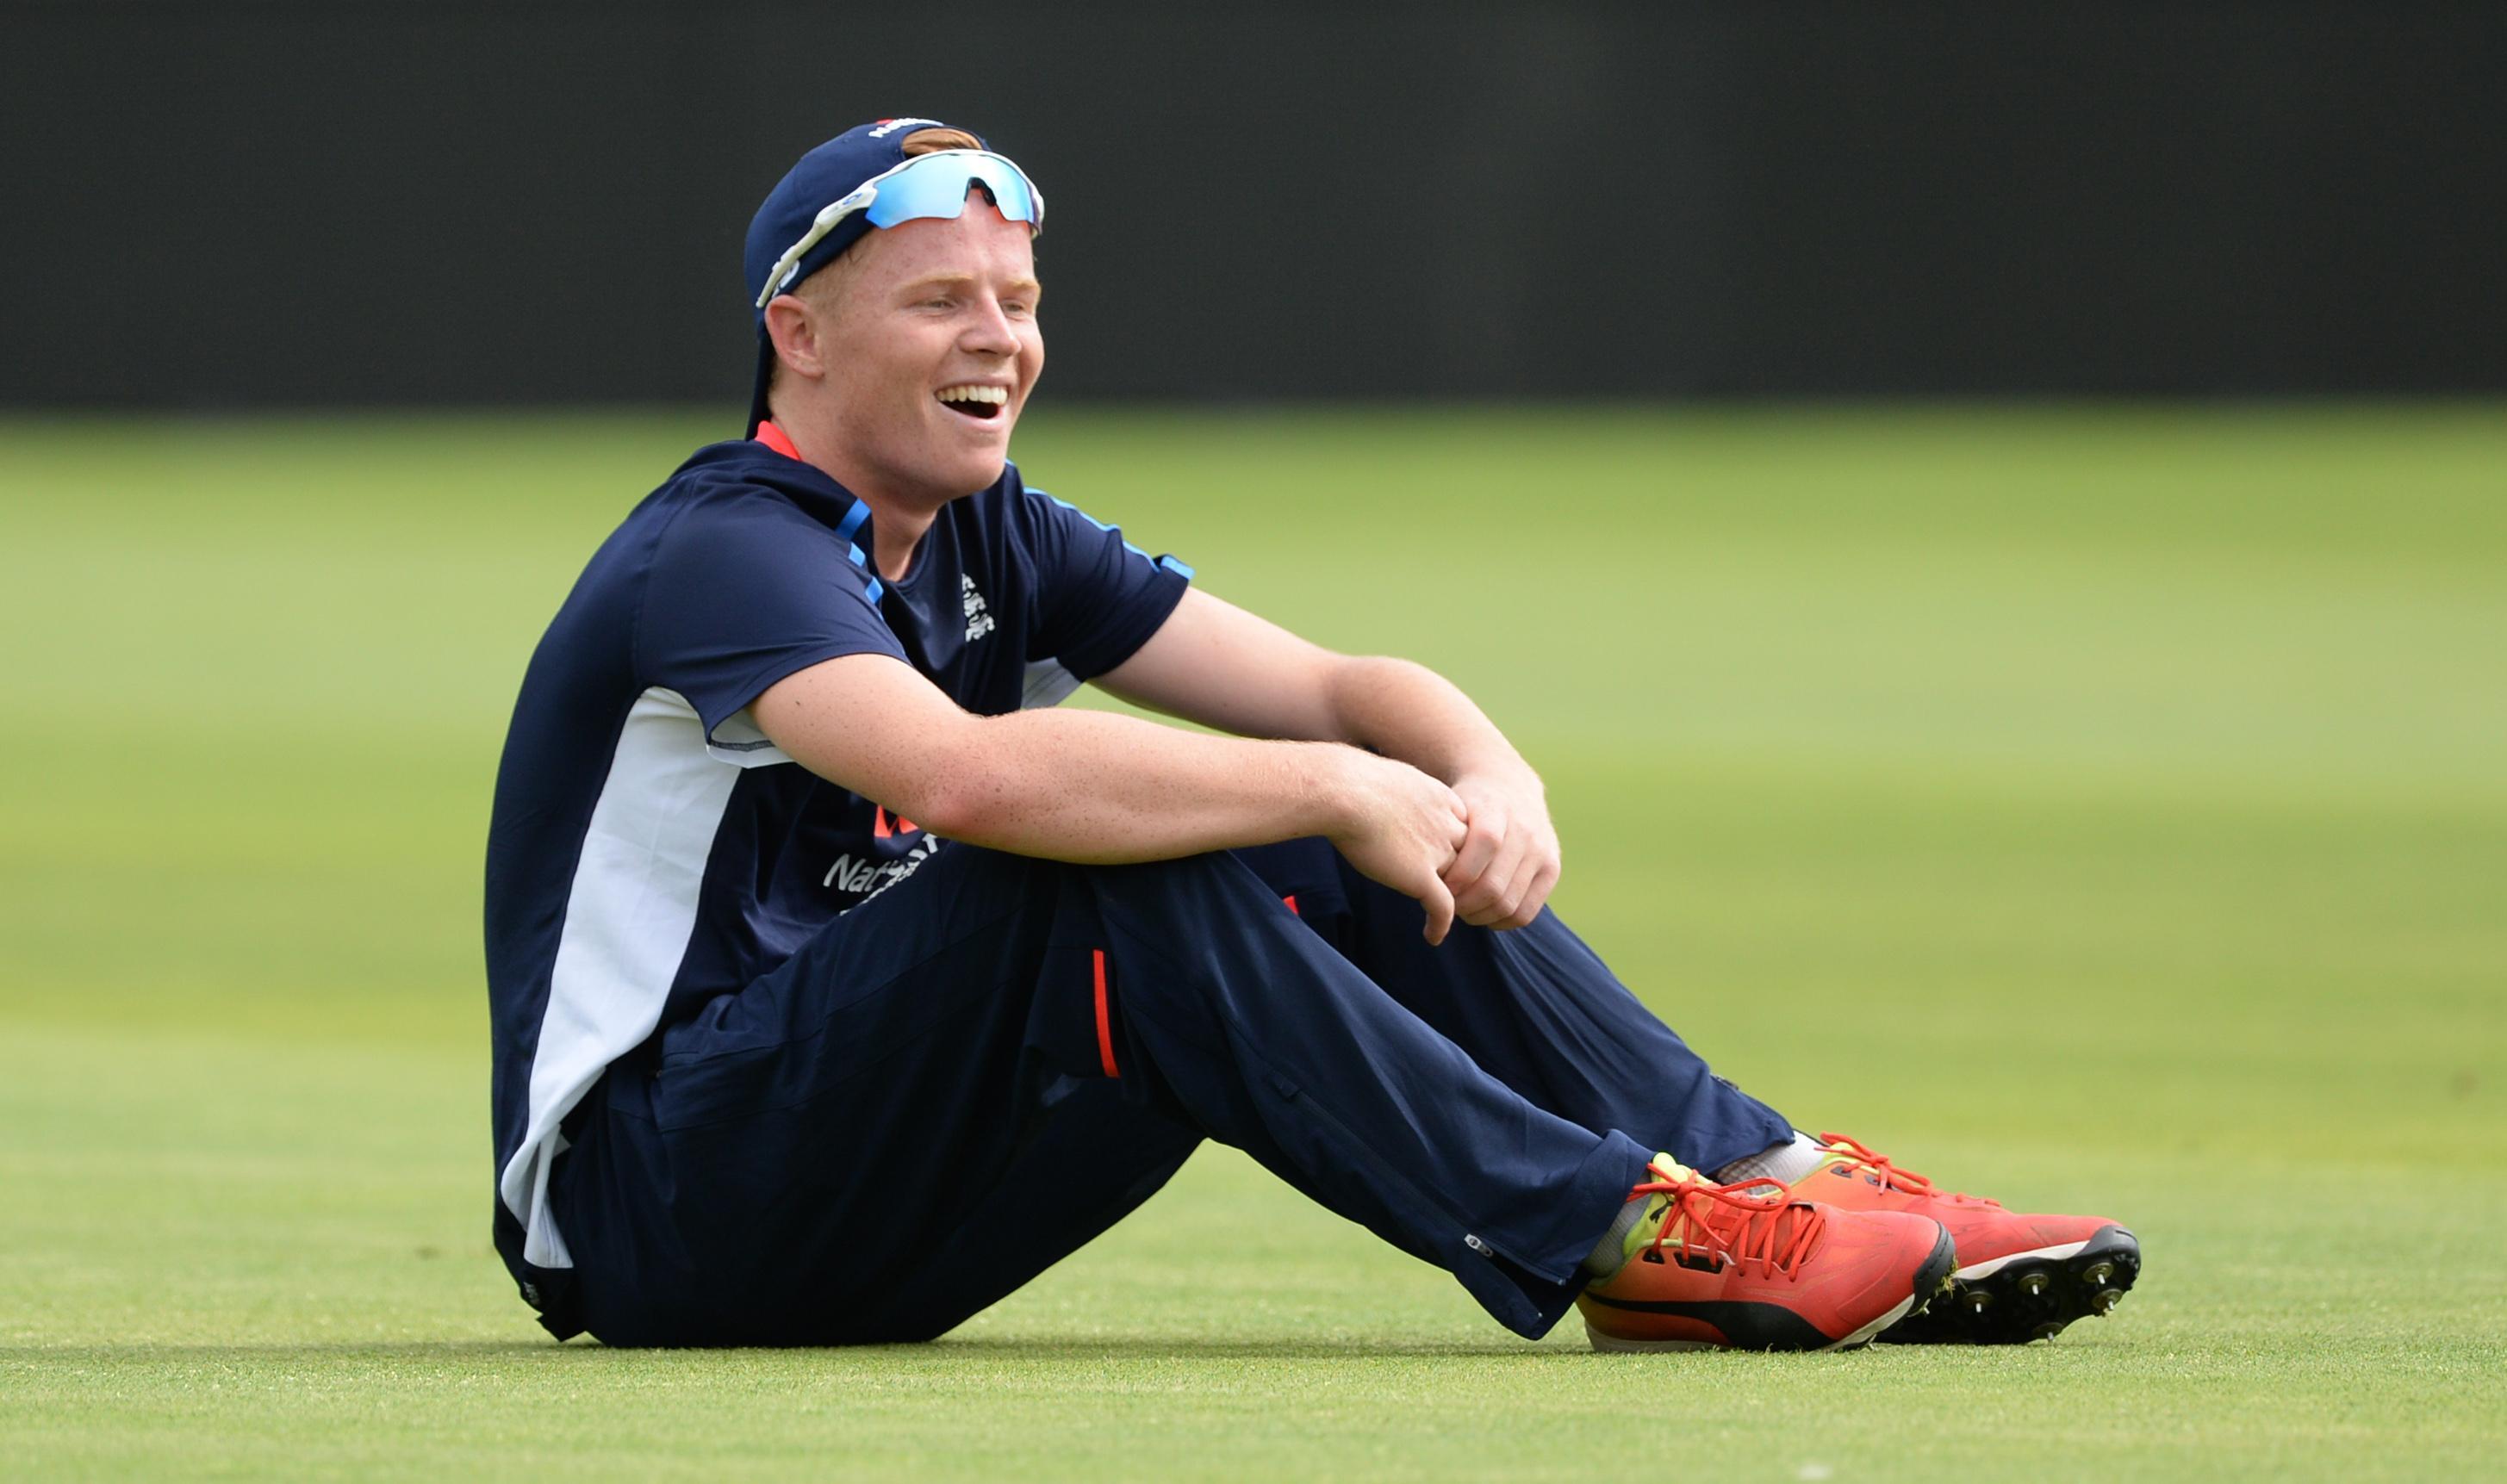 Surrey starlet Ollie Pope is preparing to make his England Test debut